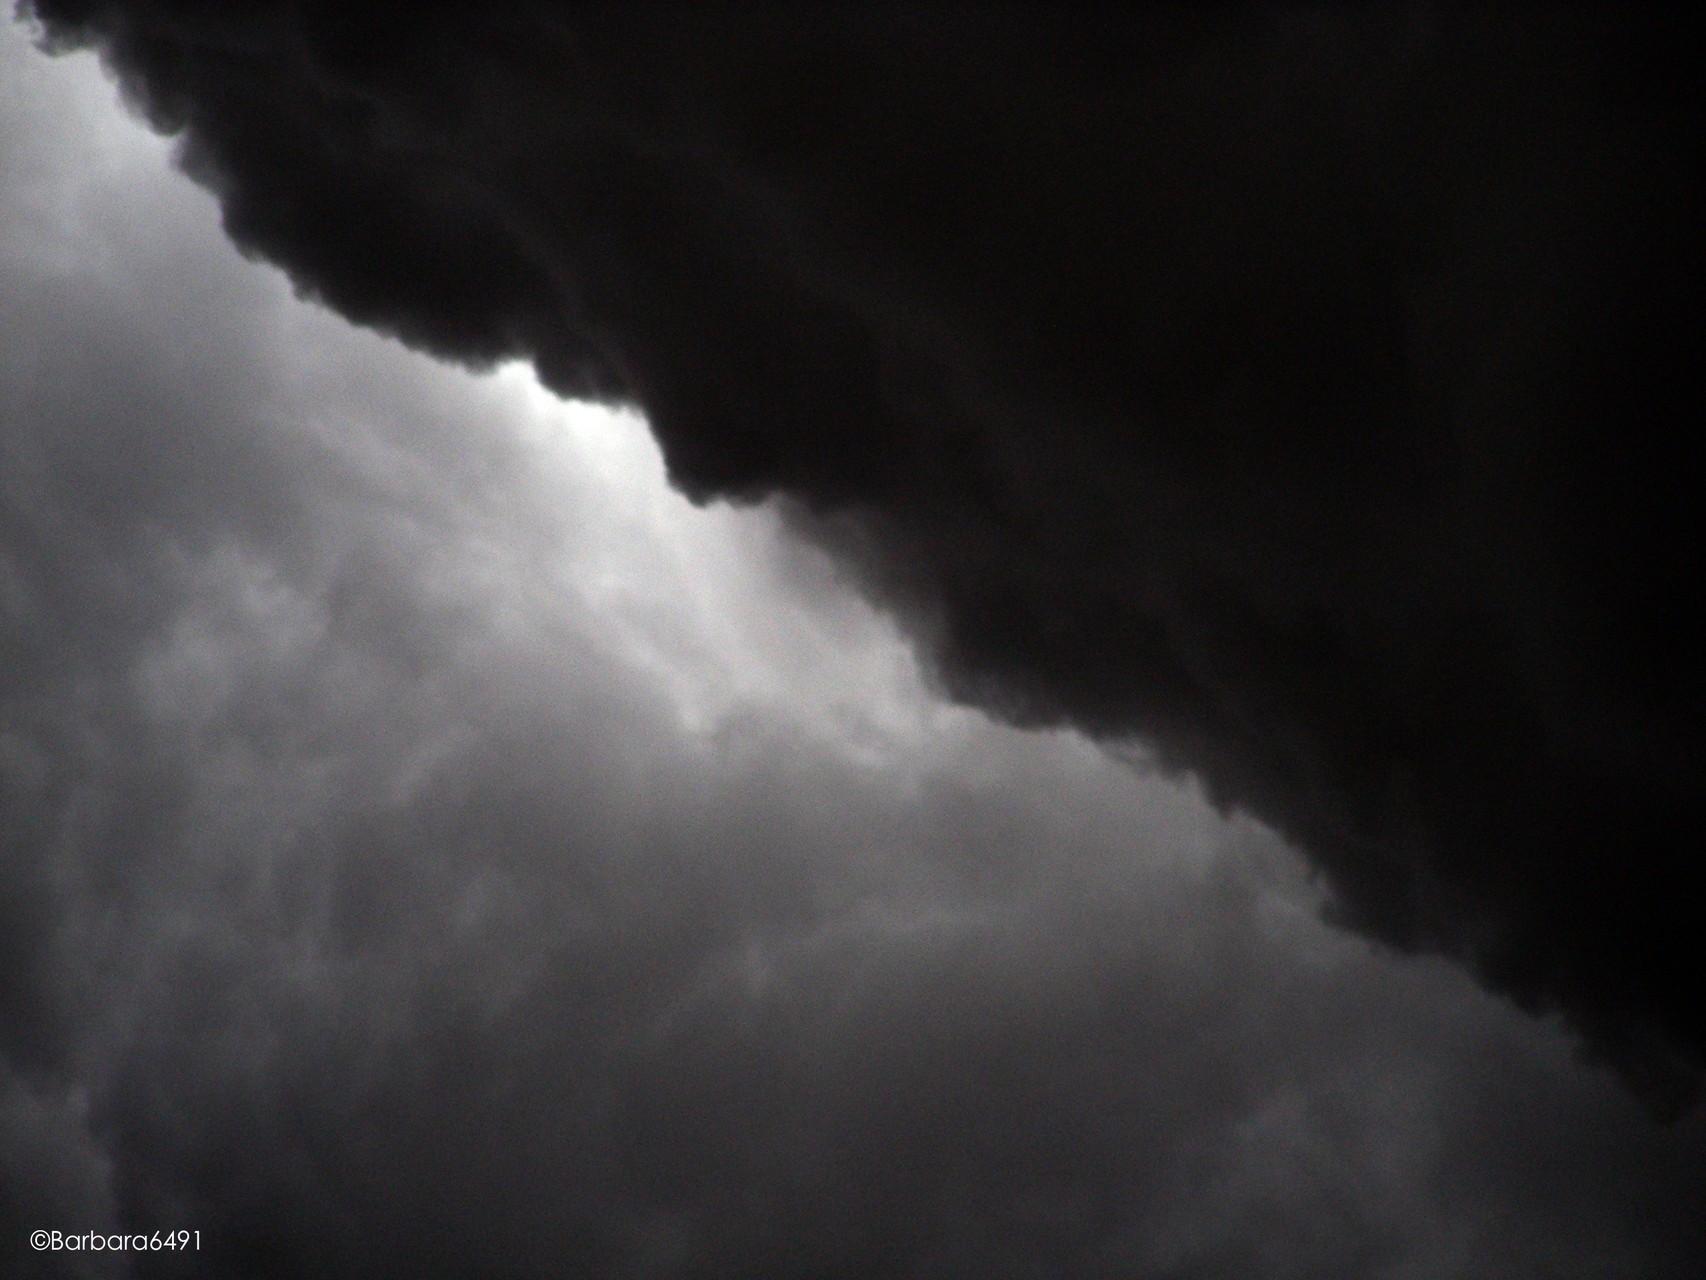 Wolkendunkel verschlingt das Licht